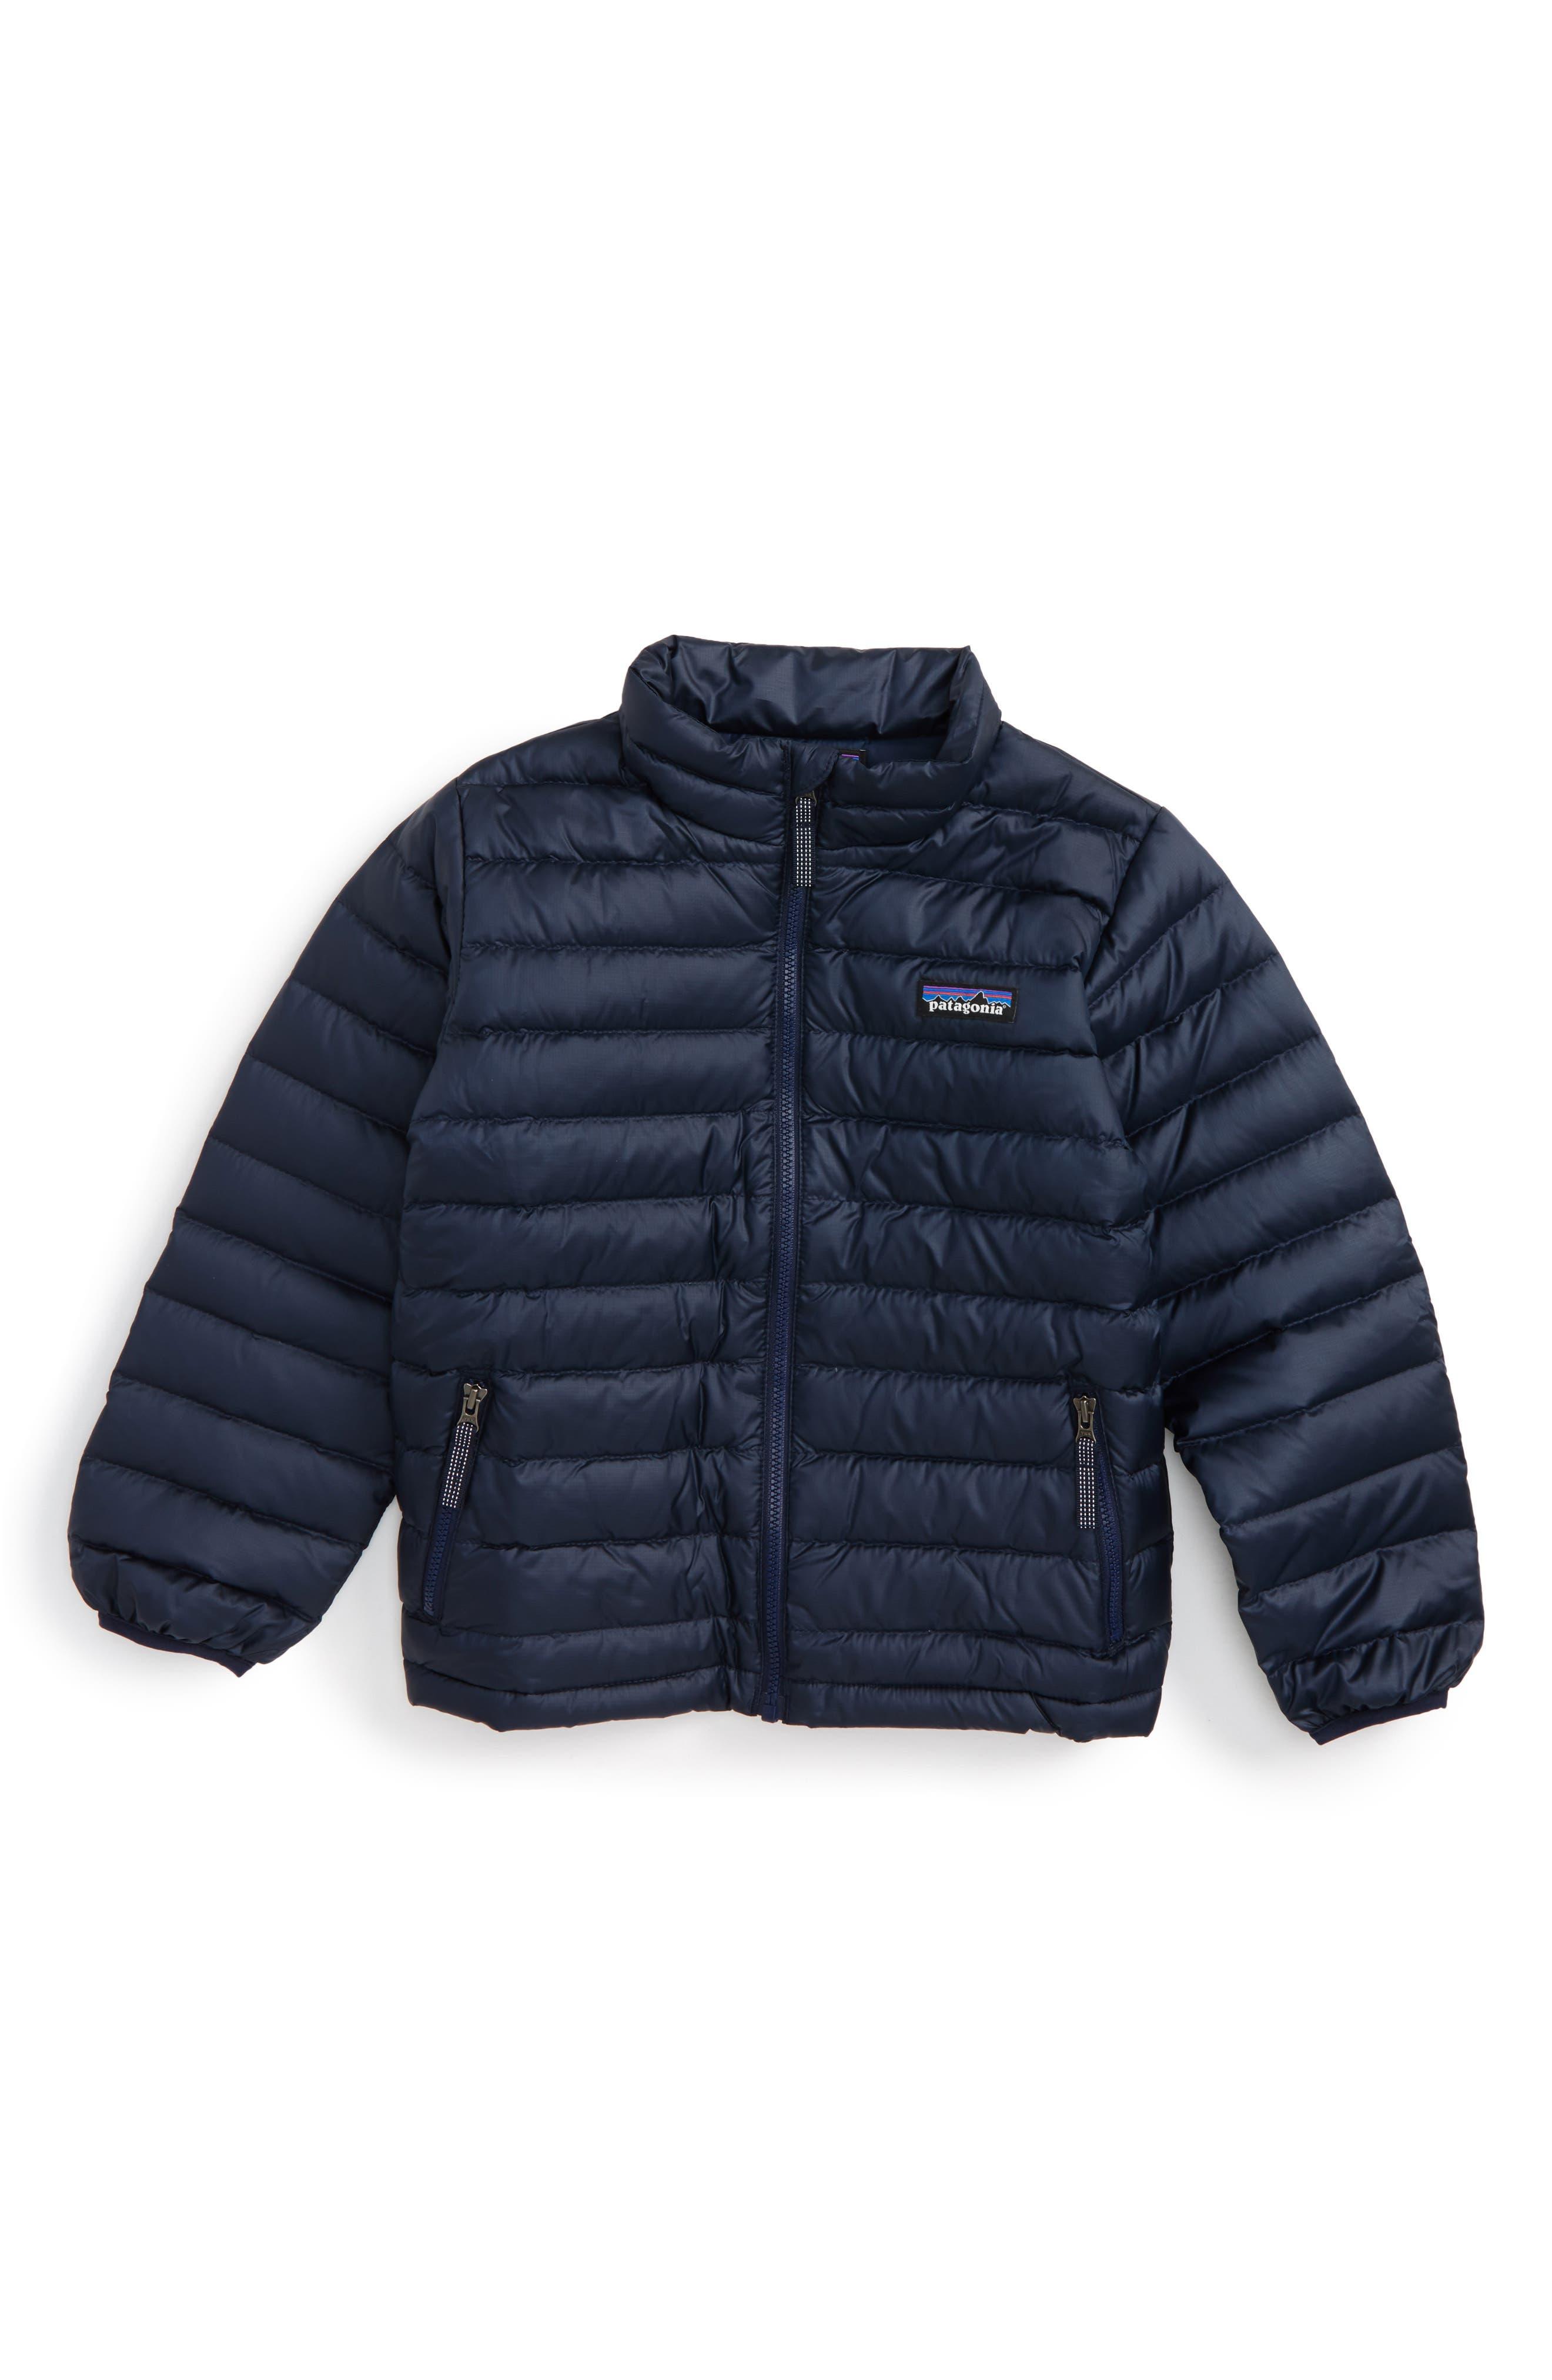 Water Repellent 600-Fill Power Down Sweater Jacket,                         Main,                         color, BALB BALKAN BLUE